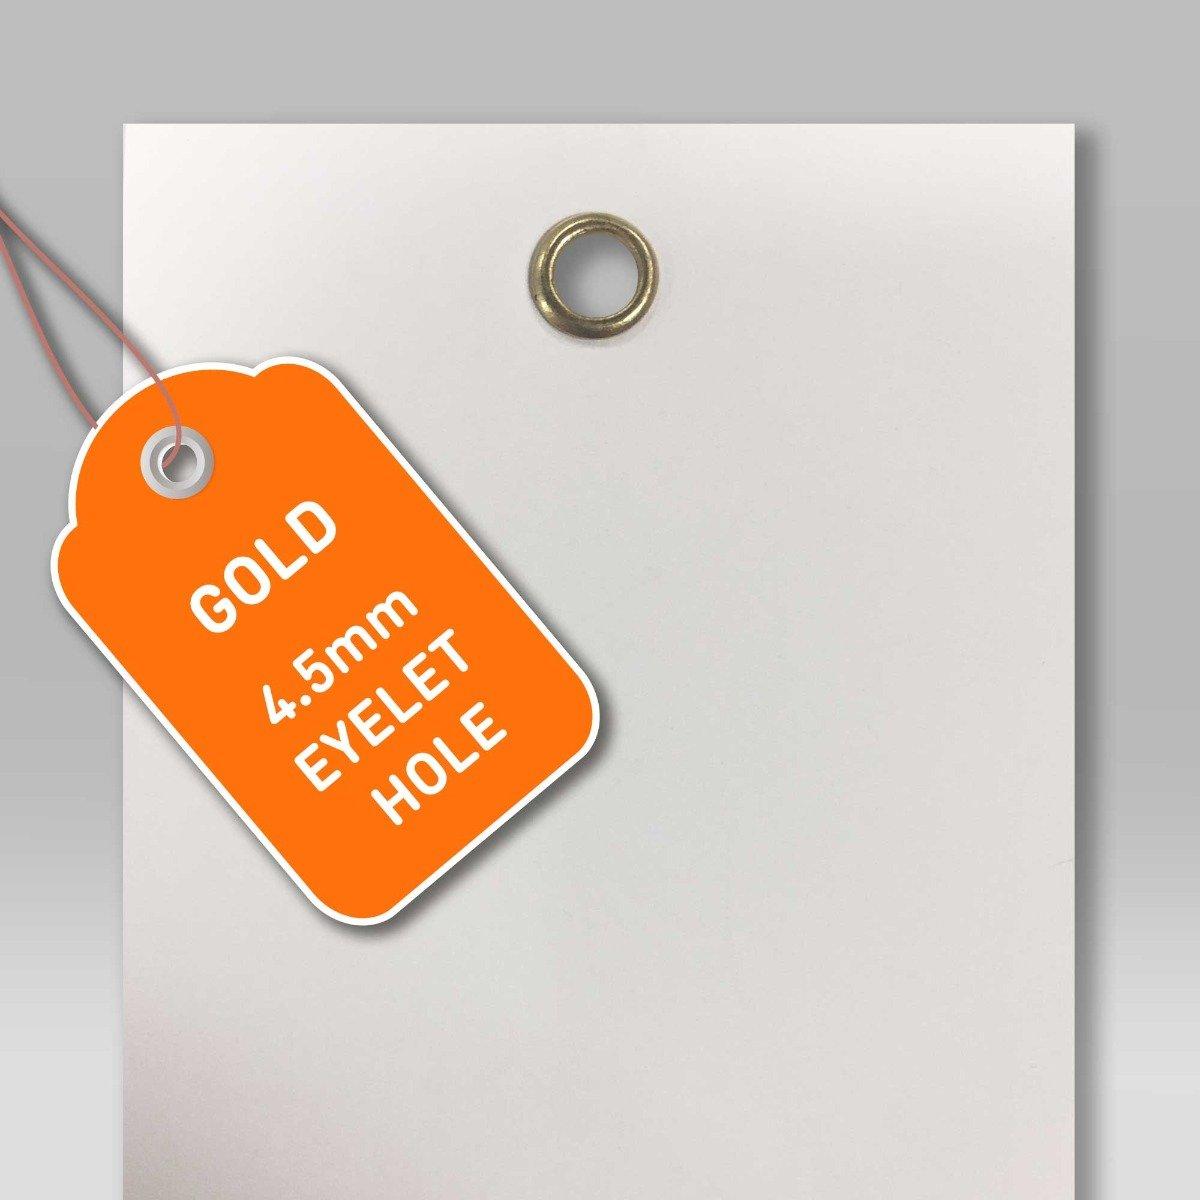 gold-eyelet-gallery